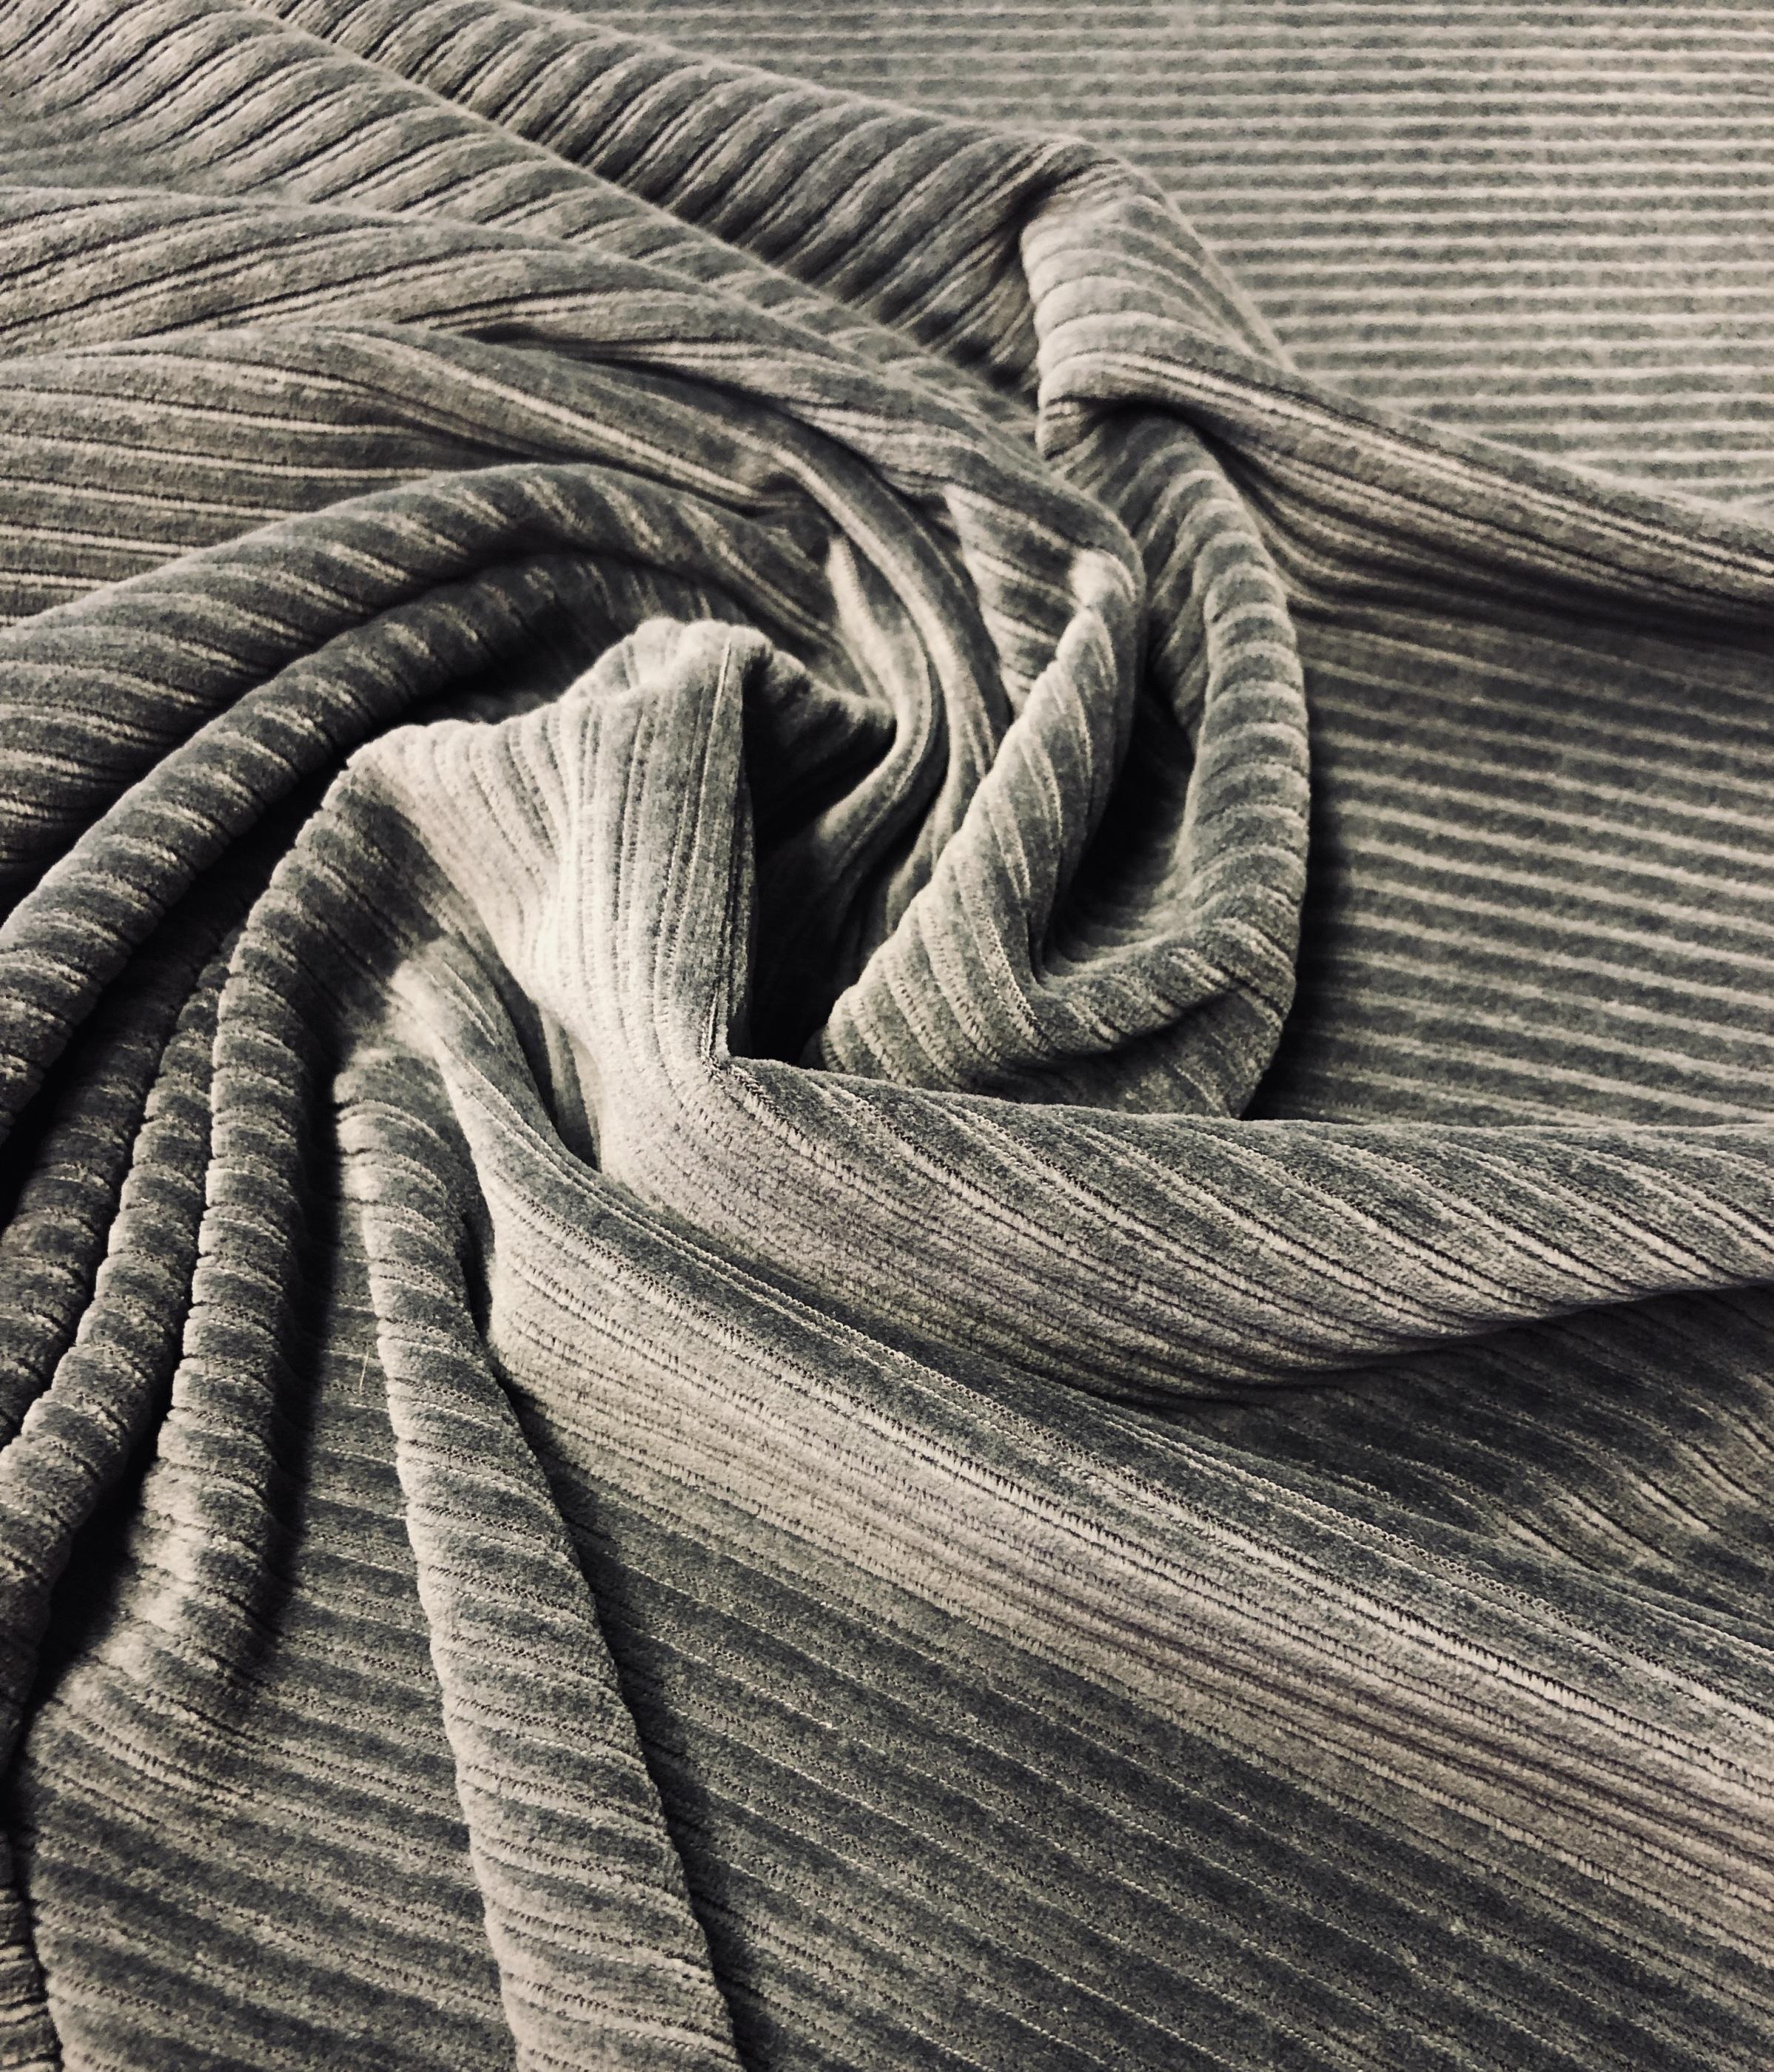 manchester stretch stretchmanchester grå metervara laholm tyglust modetyg